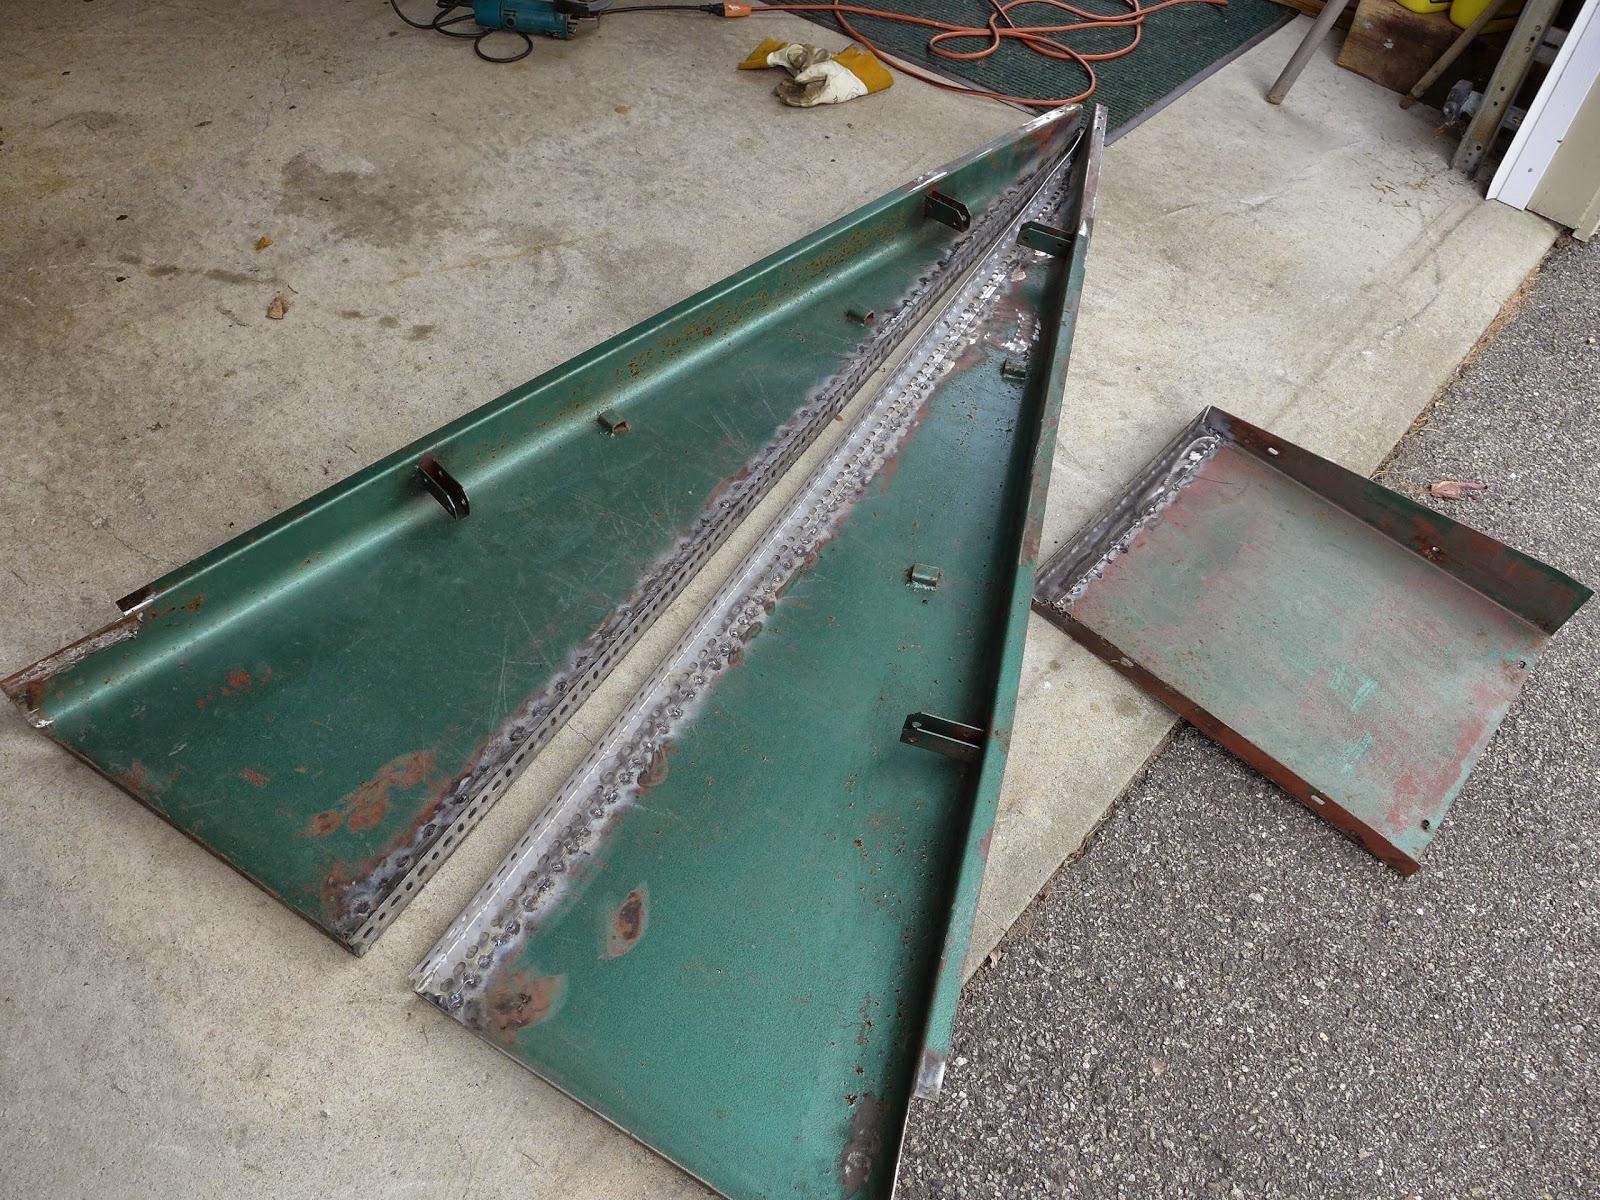 nails and sawdust rebuilding an old bilco basement bulkhead door